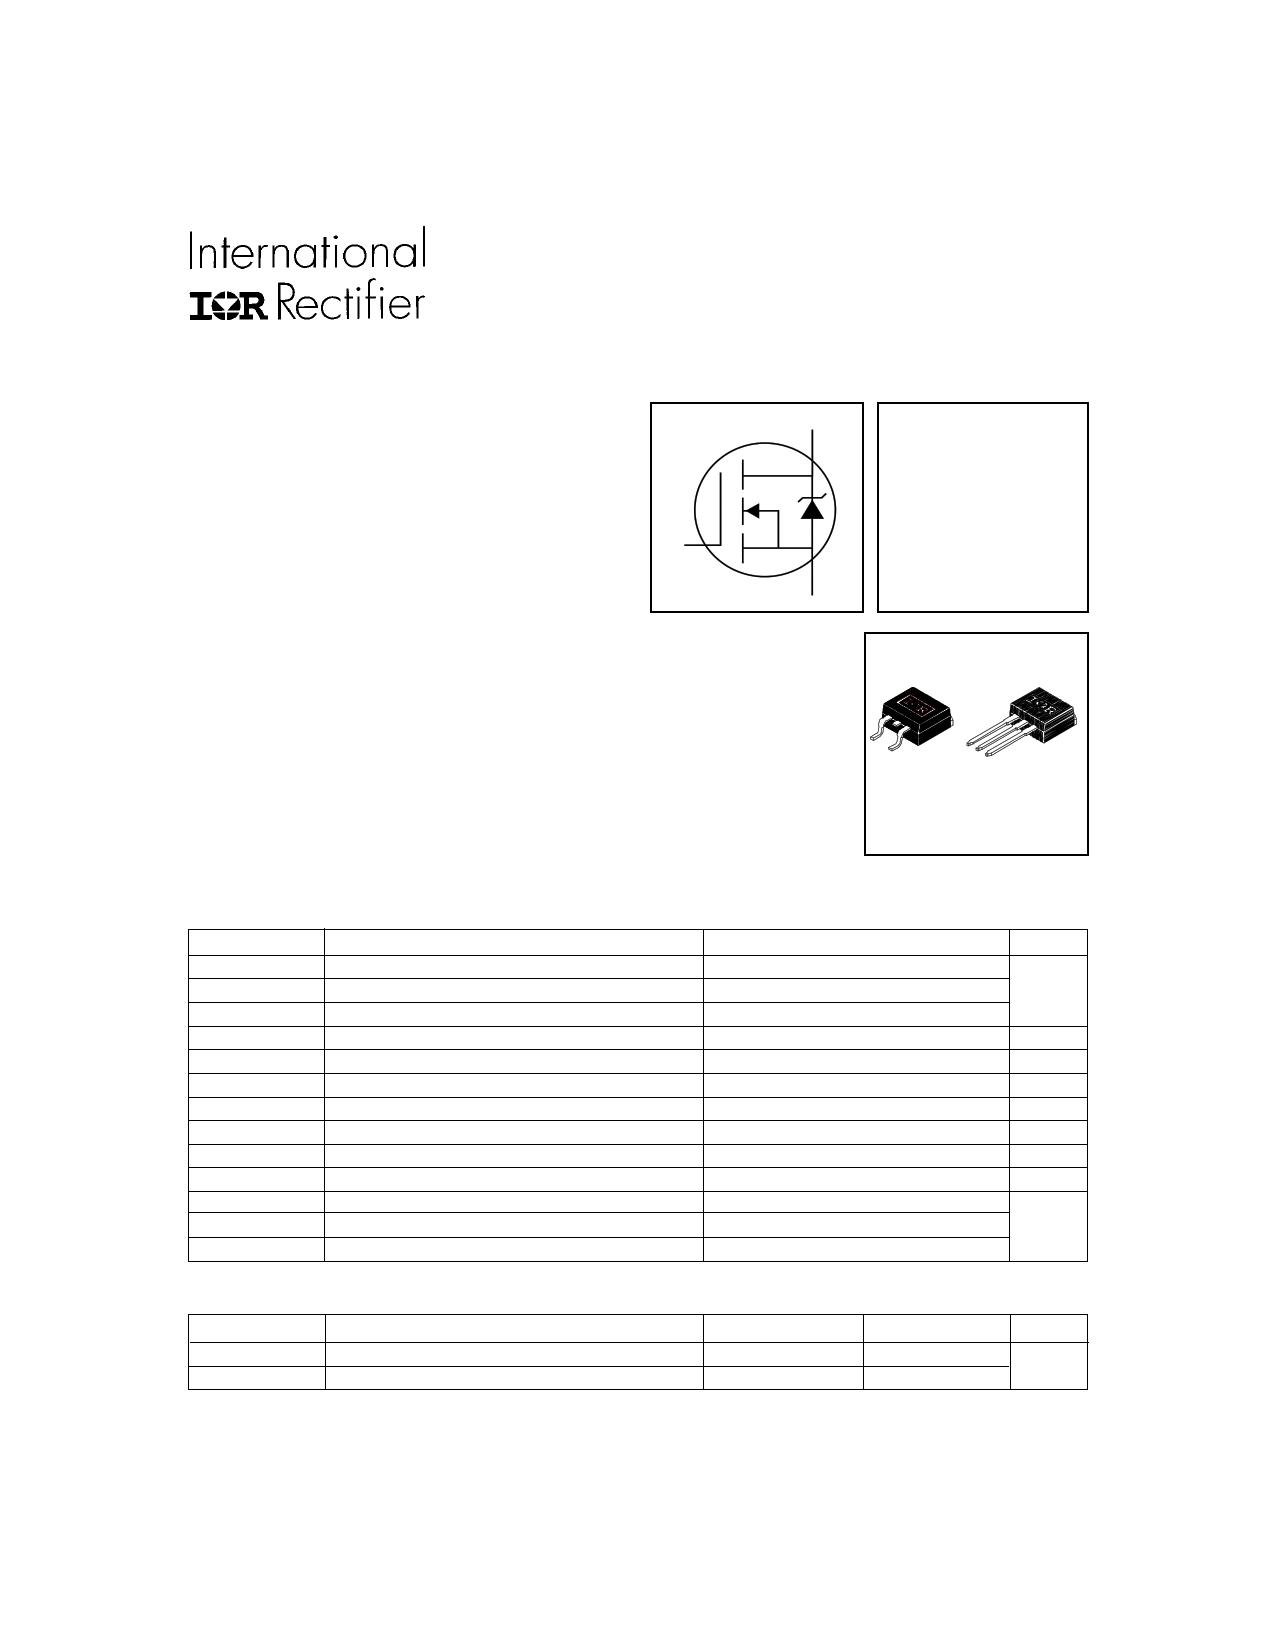 IRFZ44NL Datasheet, IRFZ44NL PDF,ピン配置, 機能